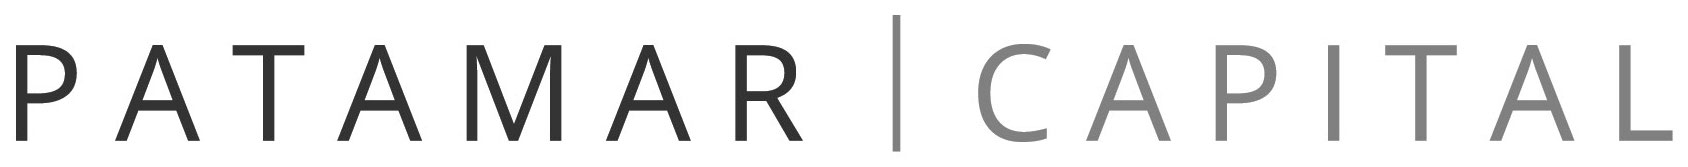 Patamar-Primary-Logo-2.jpg